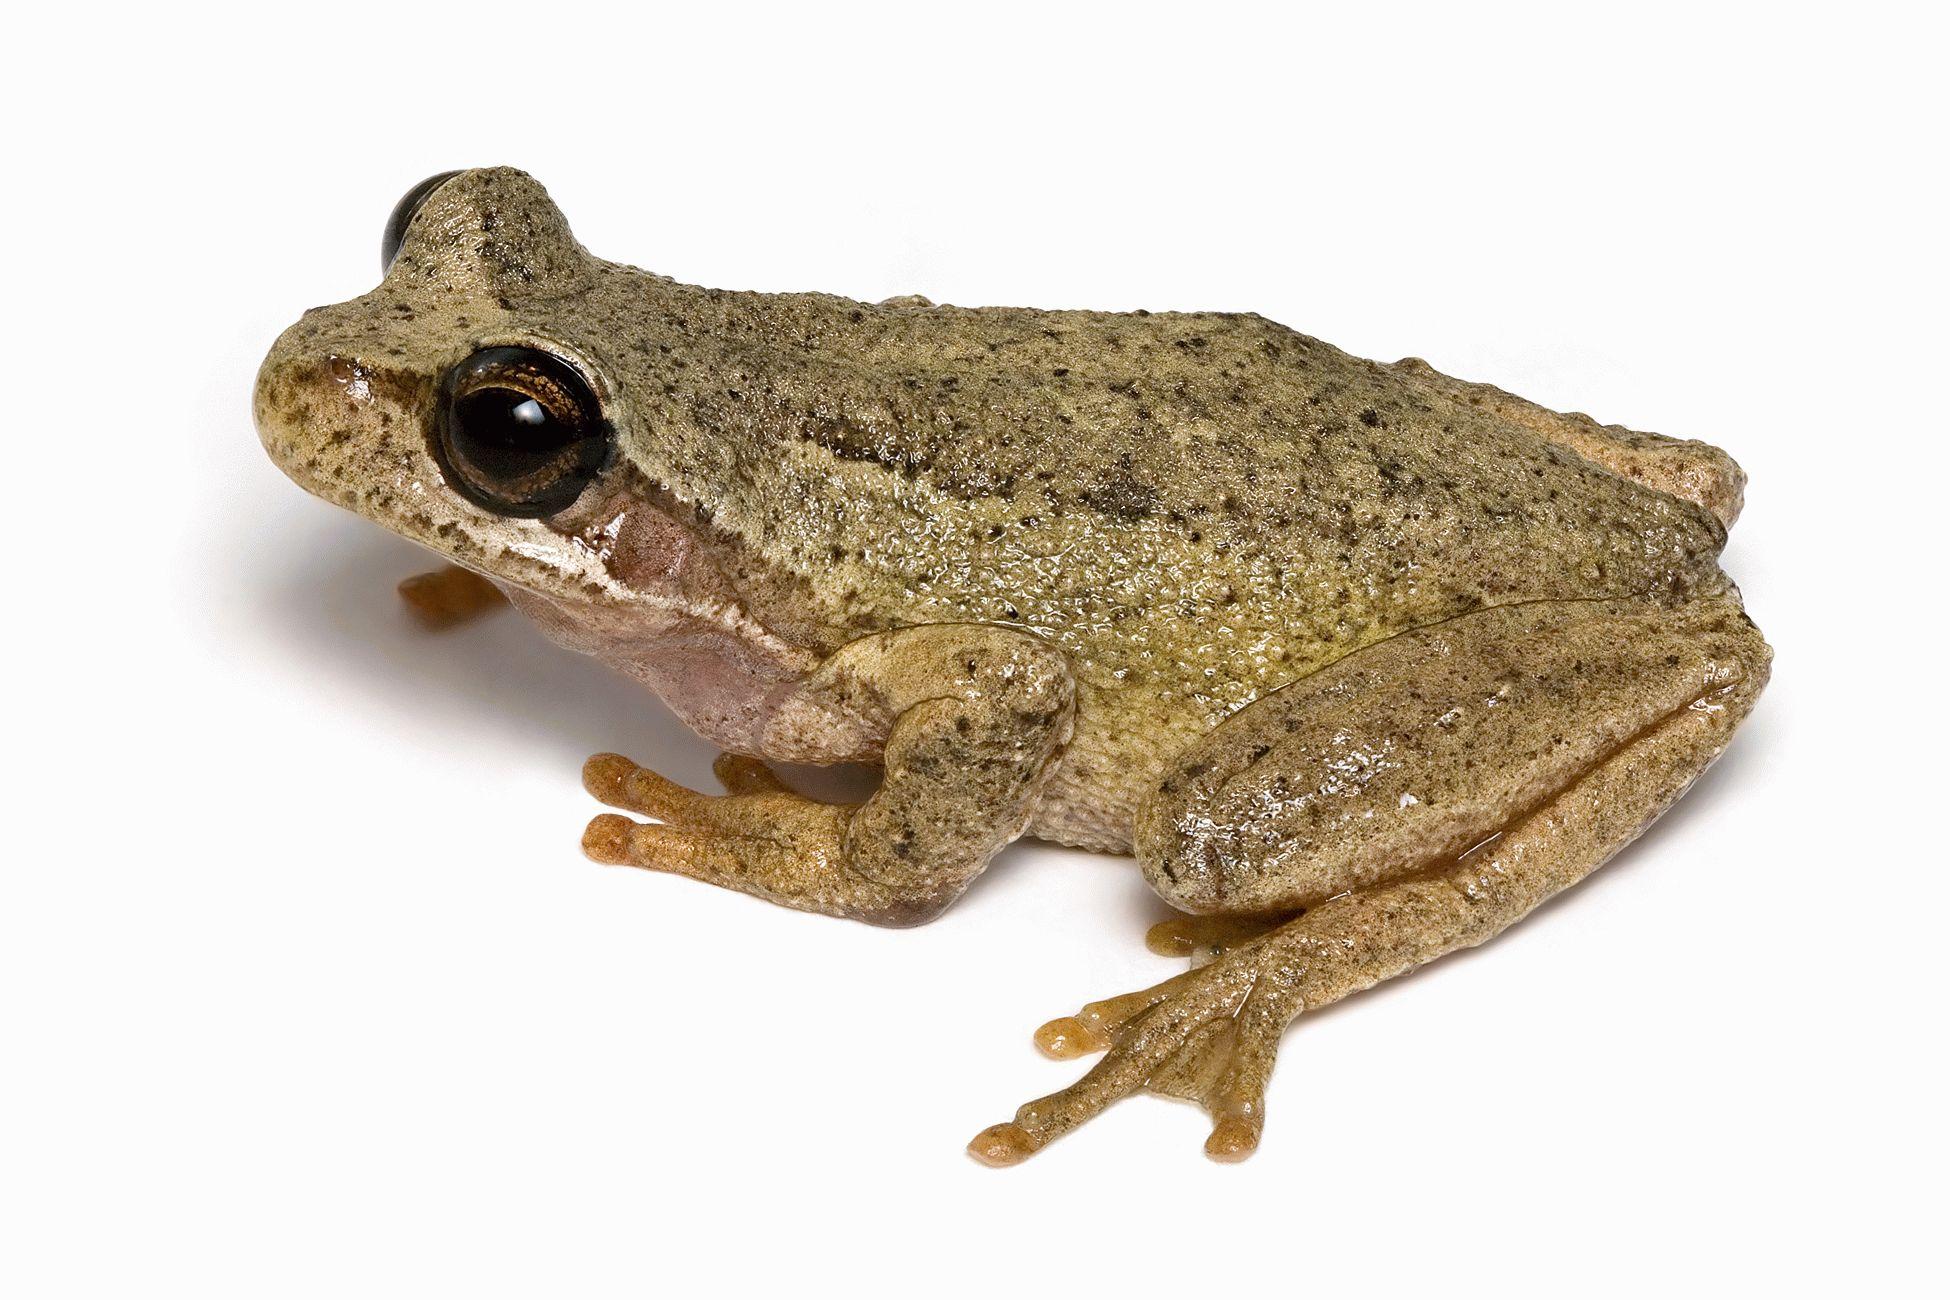 Тотемное животное Лягушка — характеристика и значение